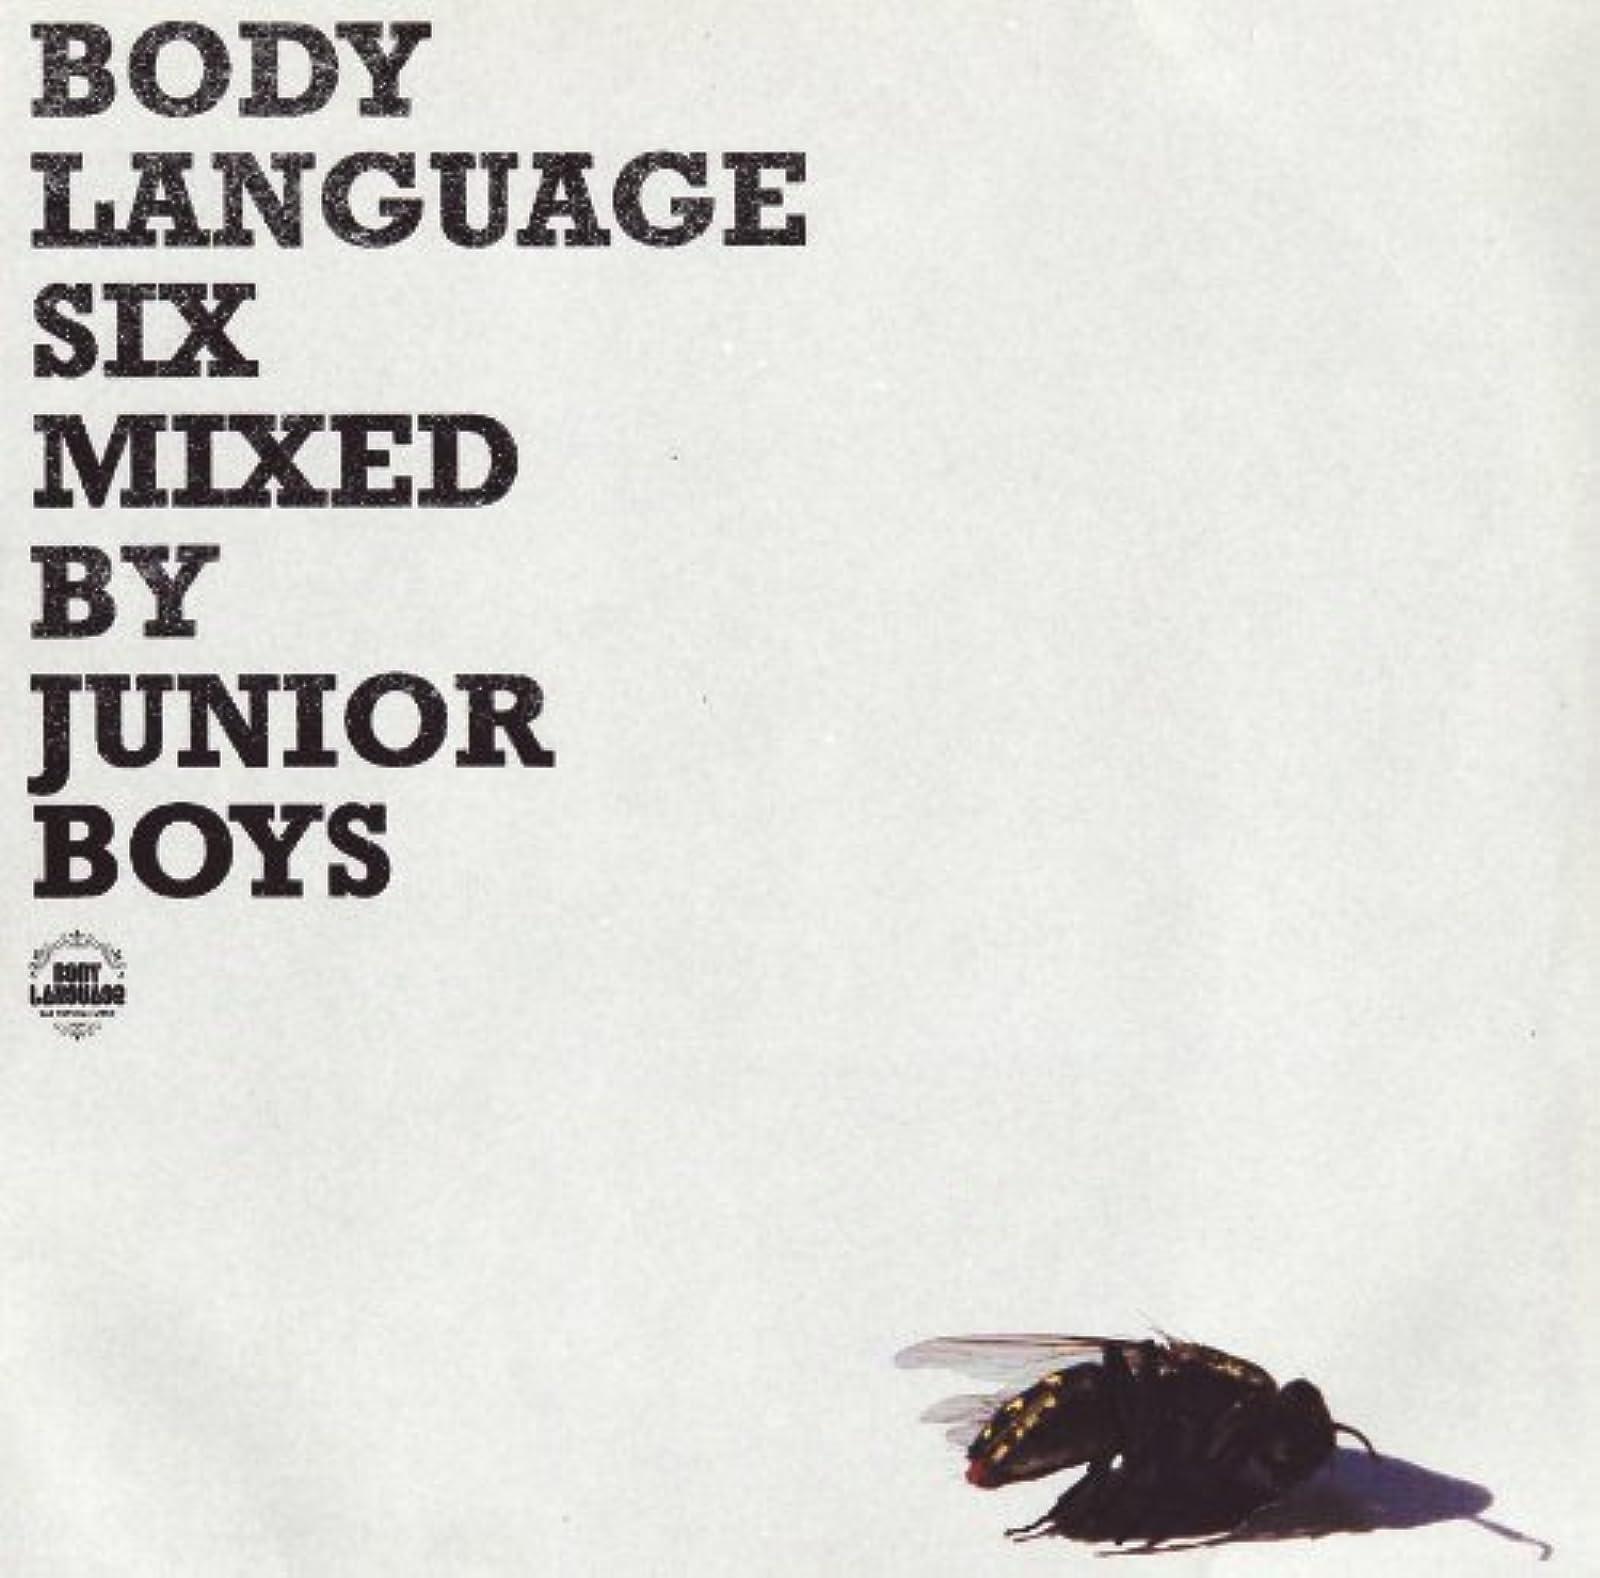 Body Language Vol 6 By Junior Boys On Vinyl Record